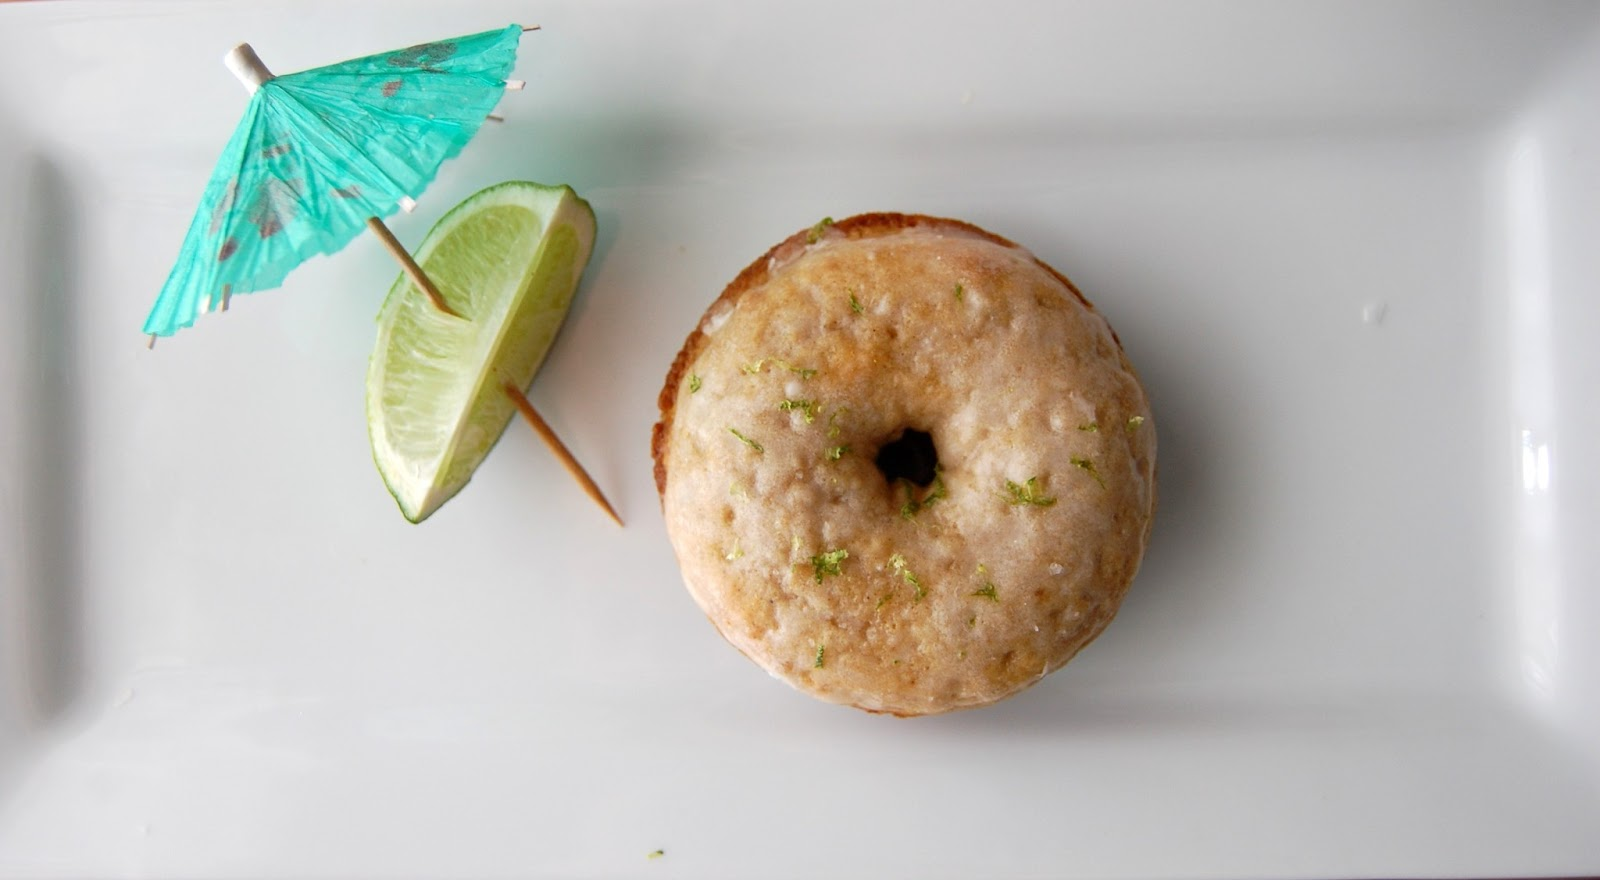 Baked Margarita Donuts